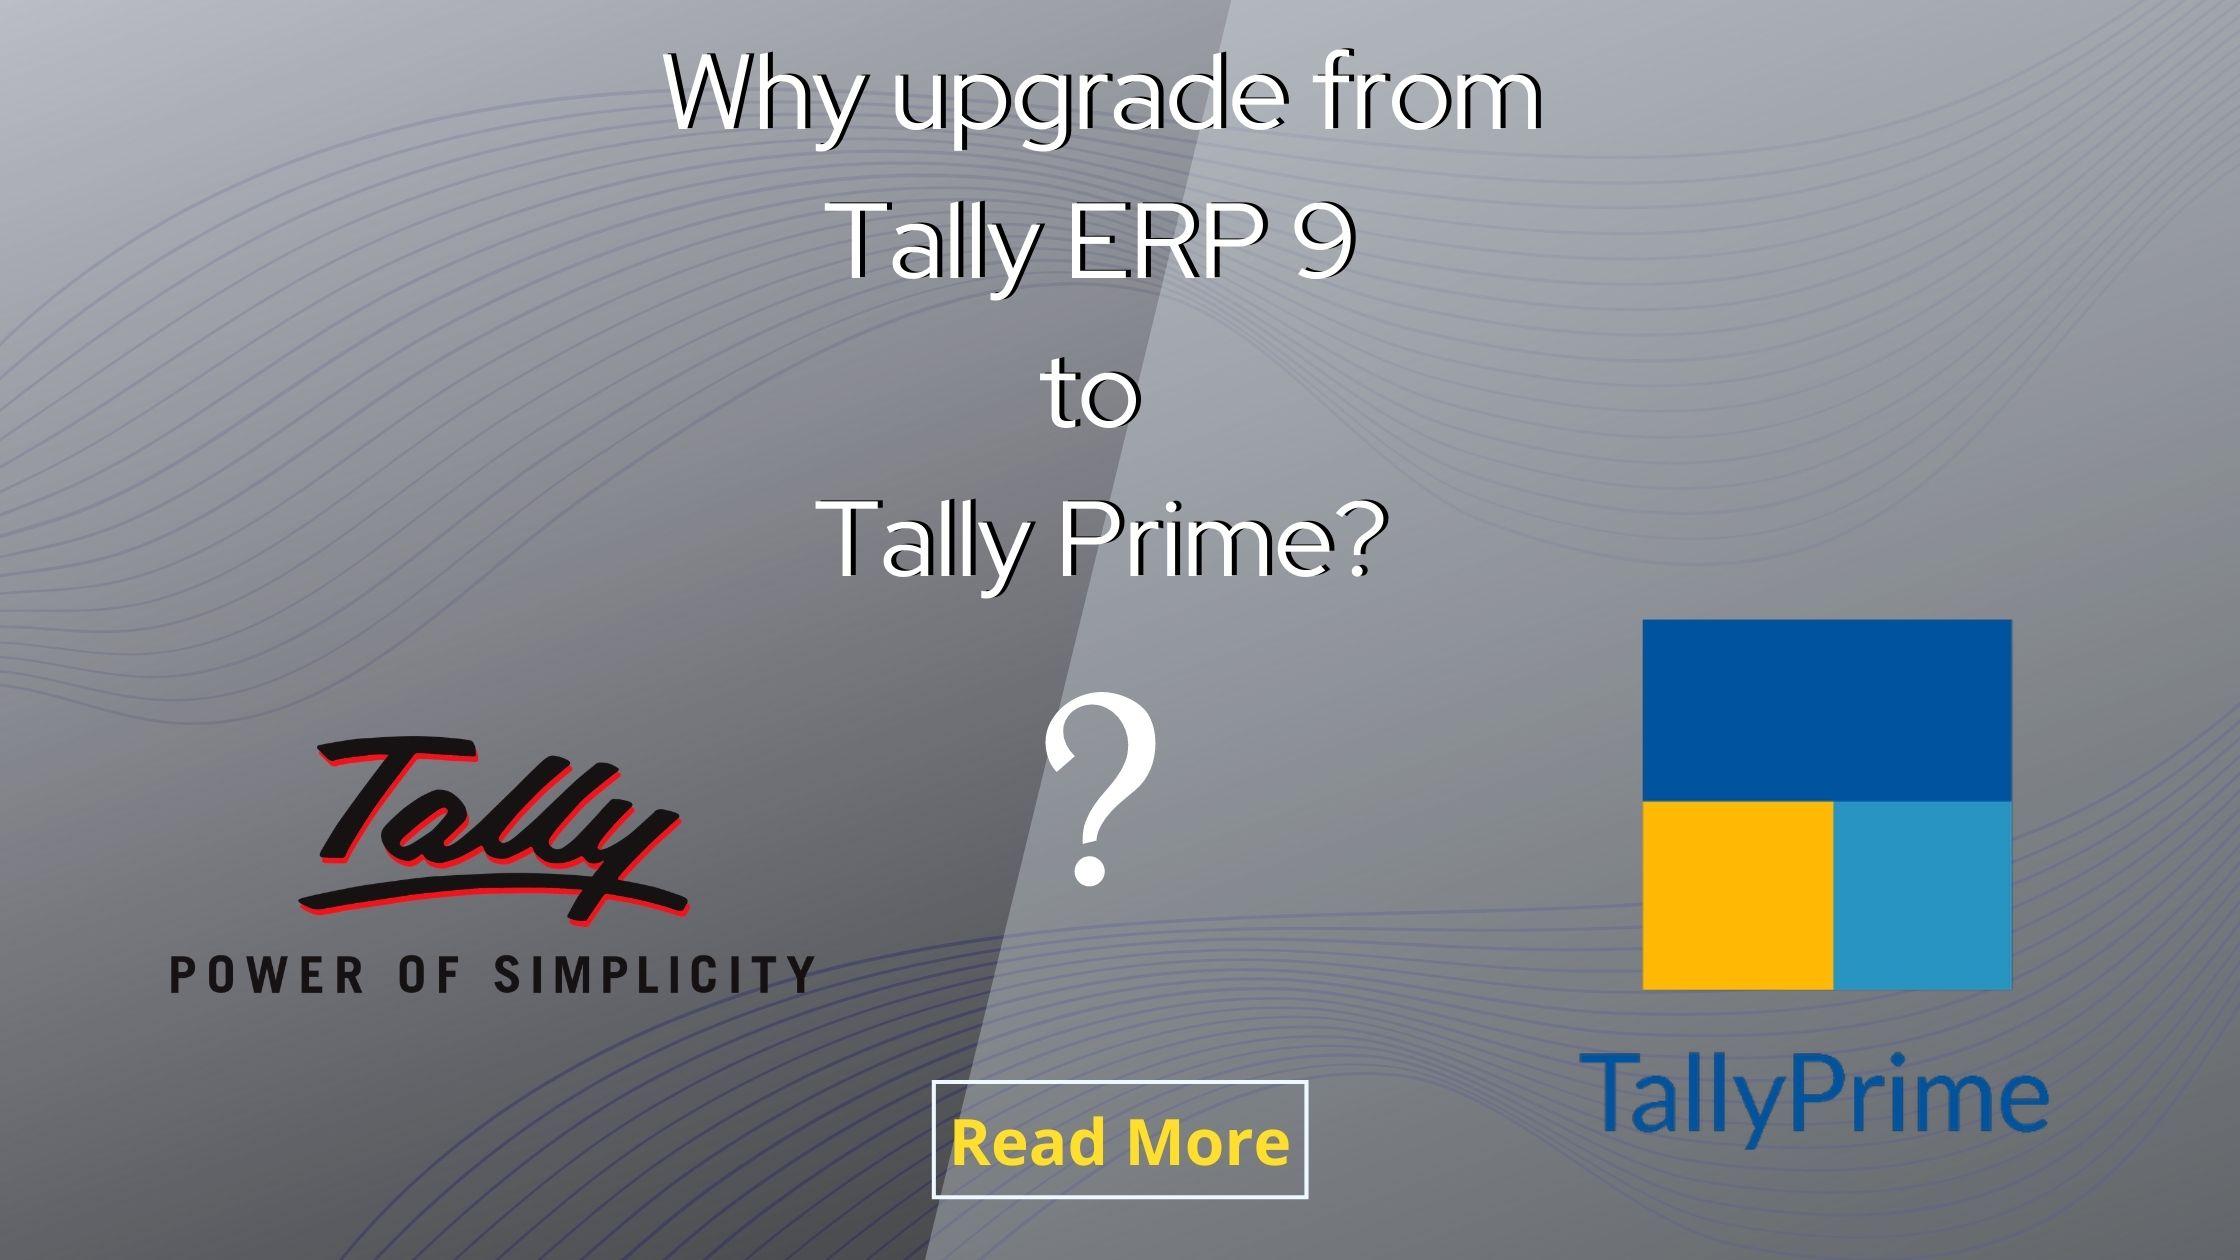 tally prime over tally erp